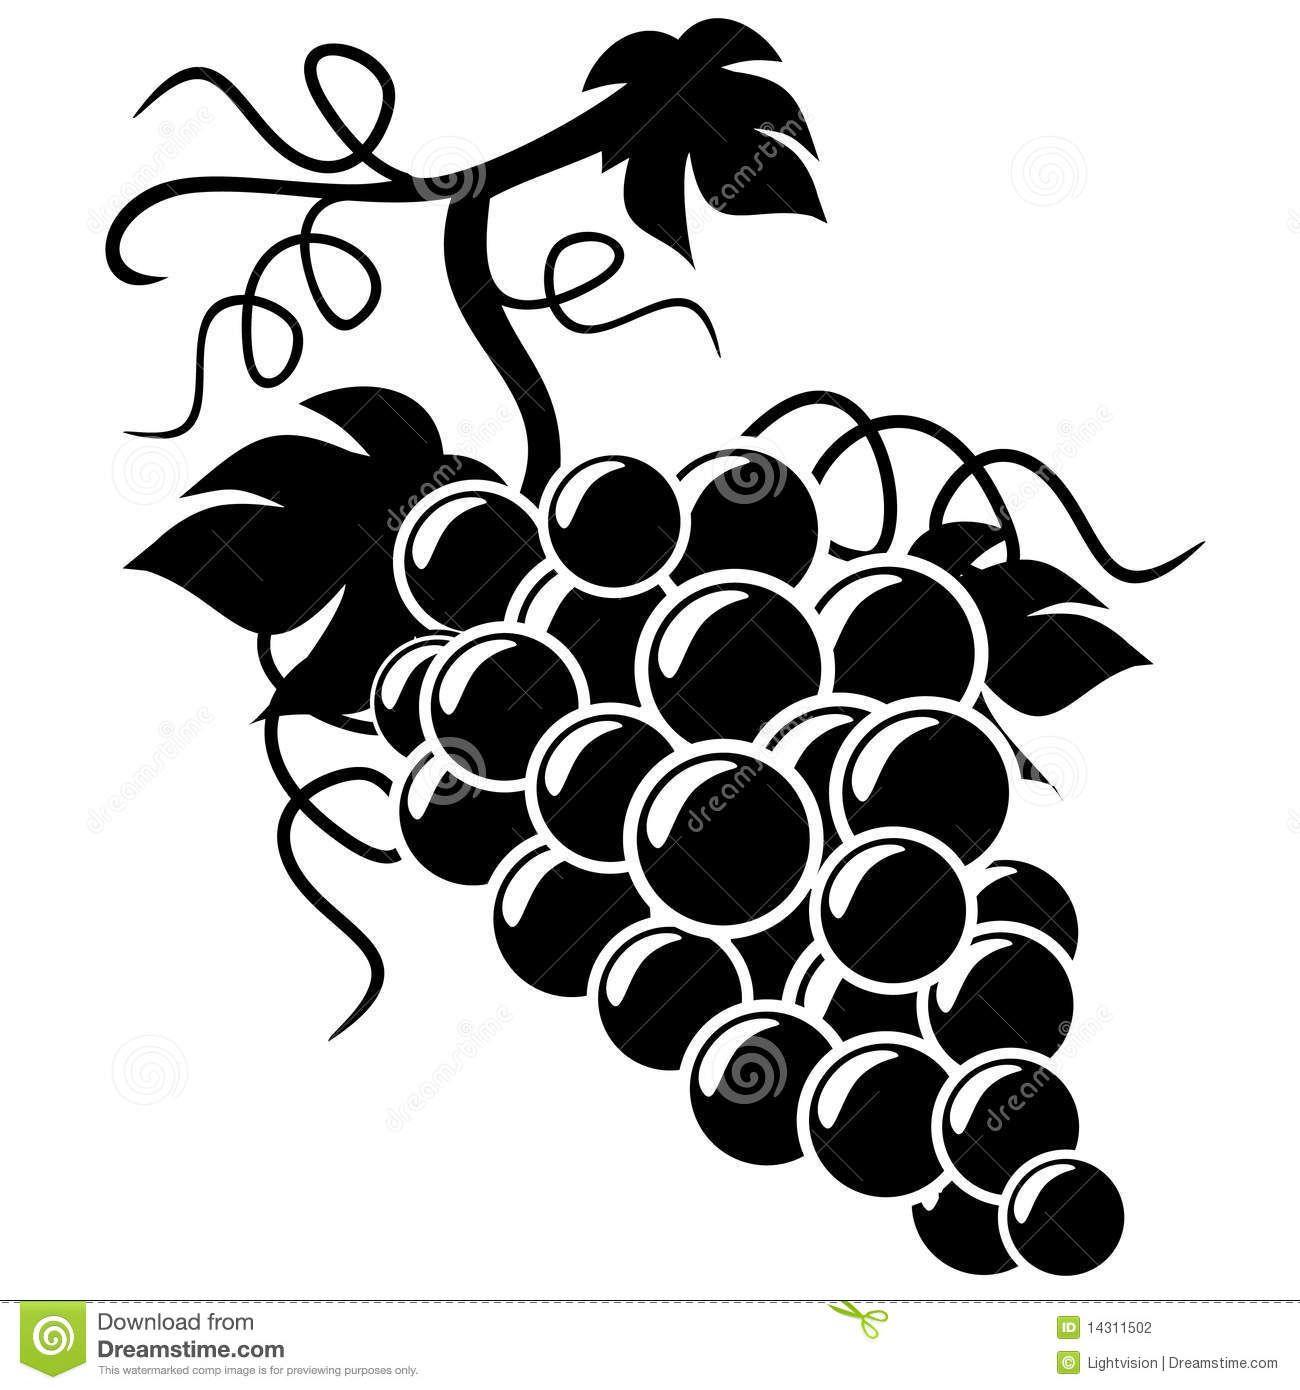 grapes silhouette Google Search Silhouette art, Art